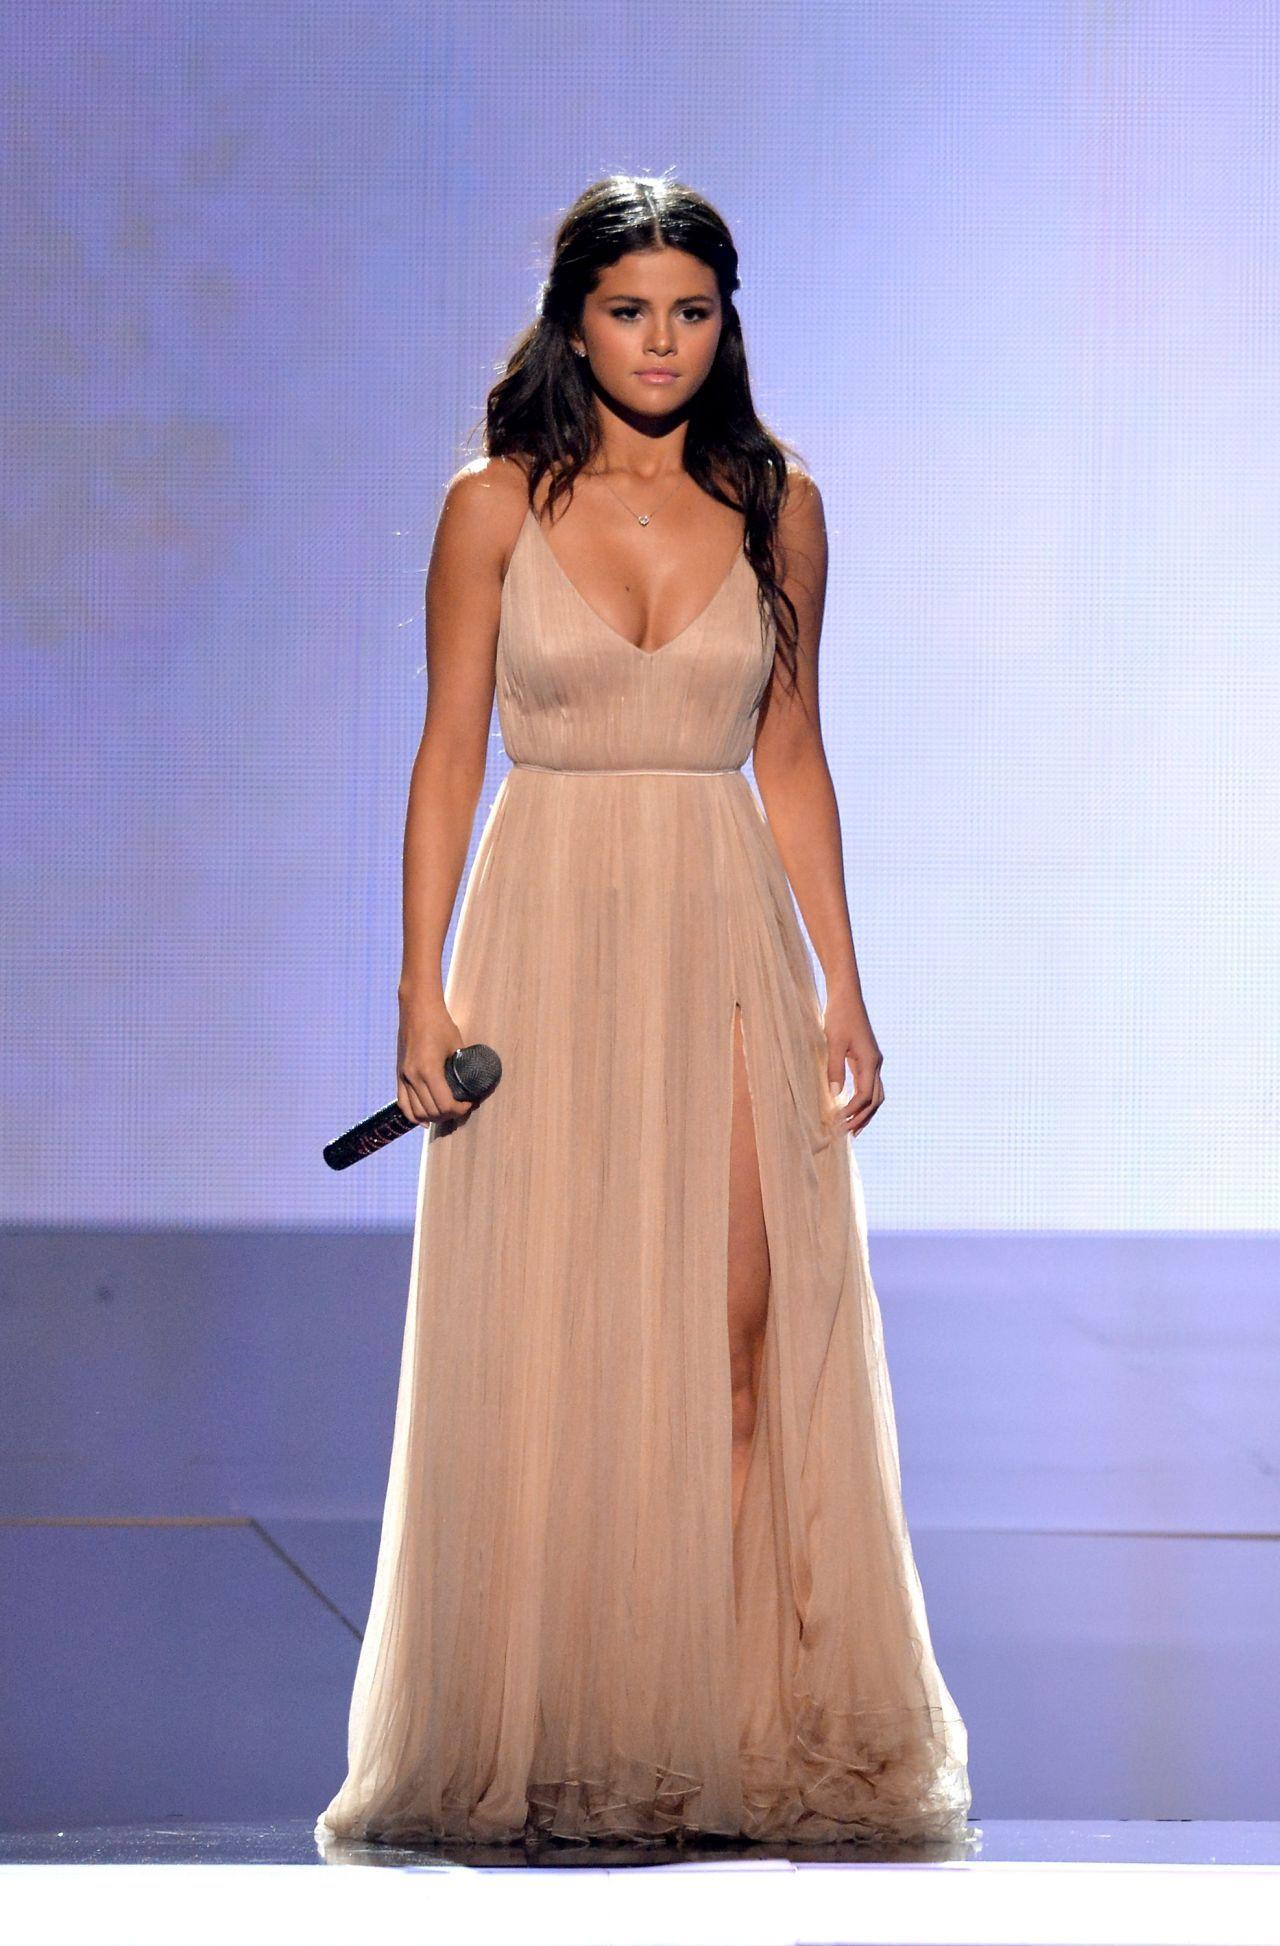 Selena Gomez Champagne Evening Prom Dress 2014 American Music Awards ...